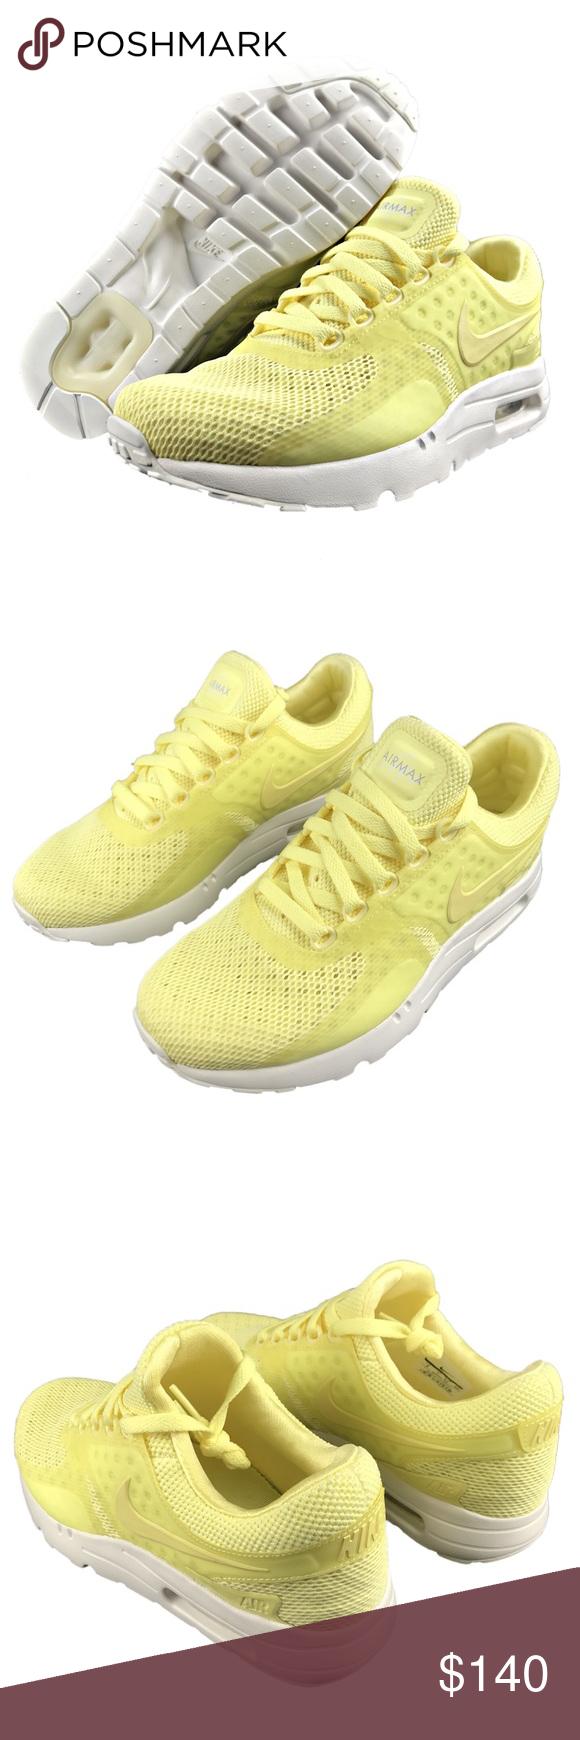 buy online fab03 77c76 Nike Air Max Zero BR Breeze Lemon Chiffon White NWT